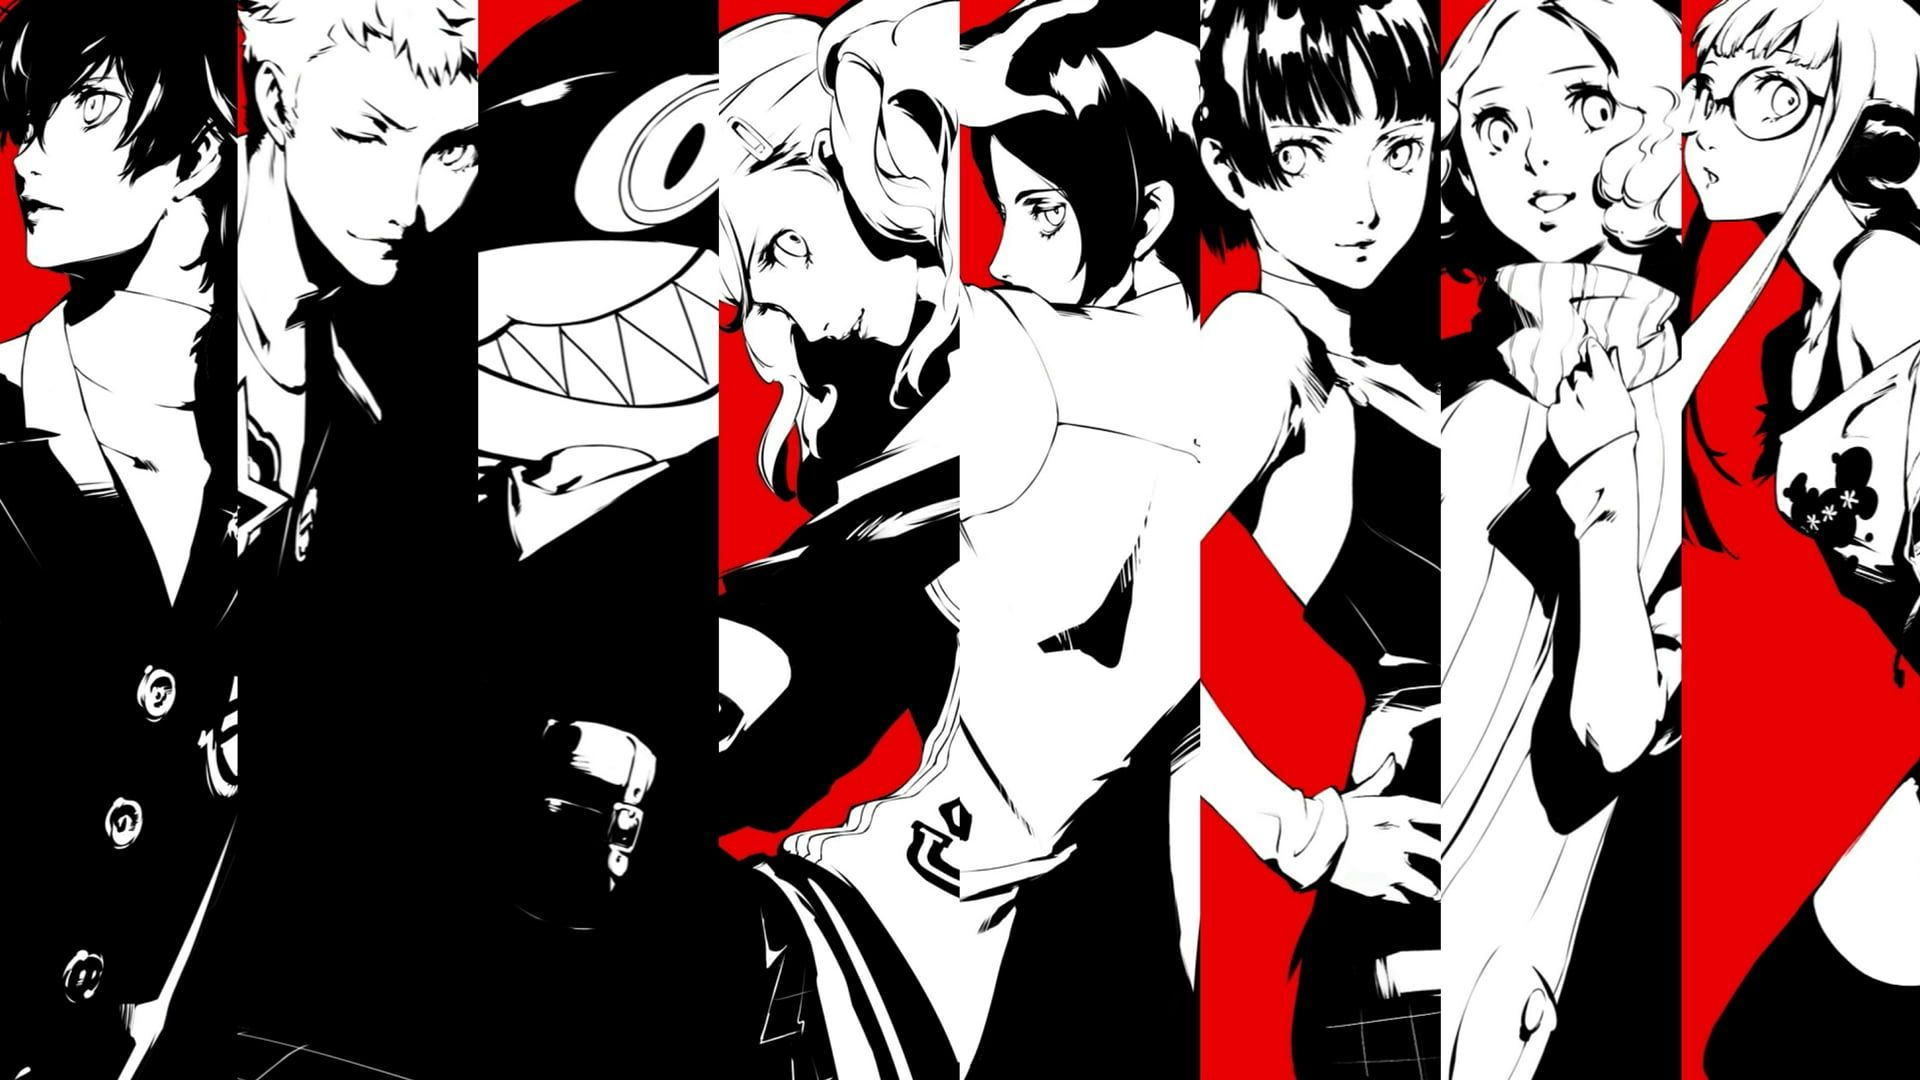 Persona Persona 5 Ann Takamaki Futaba Sakura Haru Okumura Joker Persona Makoto Niijima Morgana Persona Ryuji Sakamoto In 2020 Haru Okumura Persona 5 Persona 5 Ann